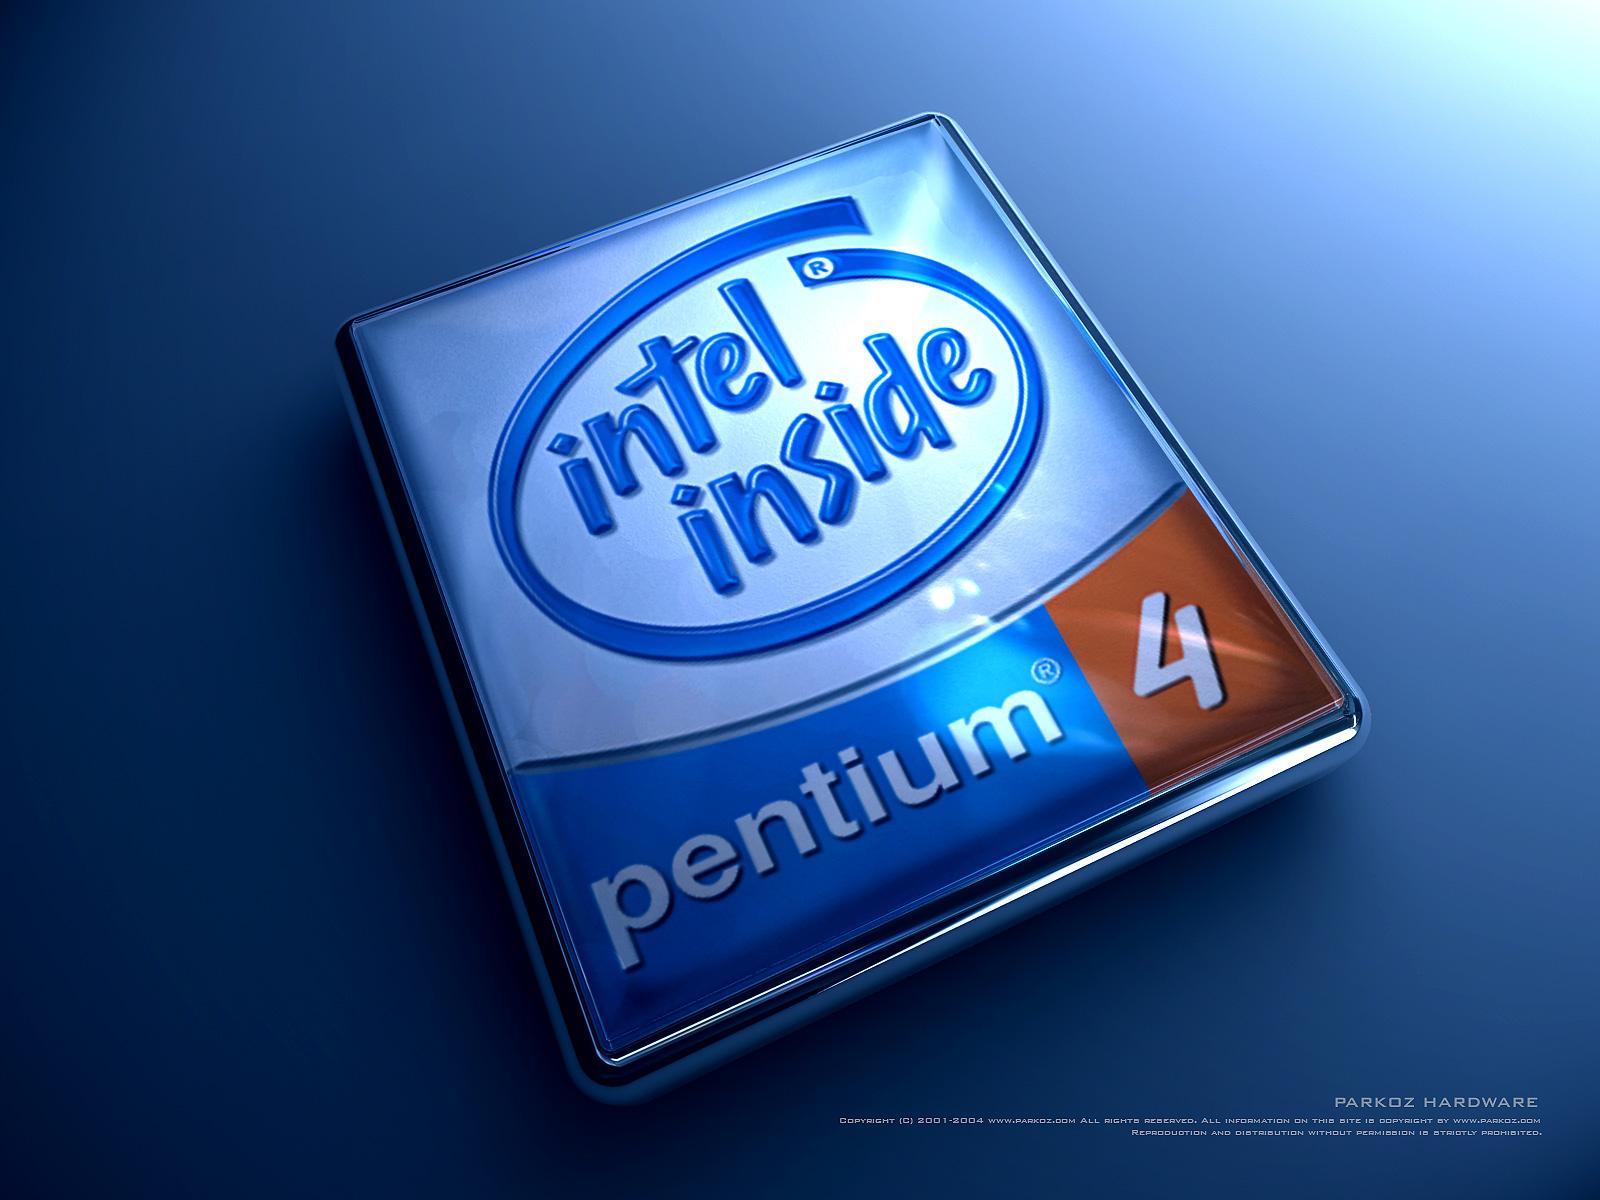 Pentium 4 Windows 7 Computer hardware Desktop Wallpapers 1600x1200